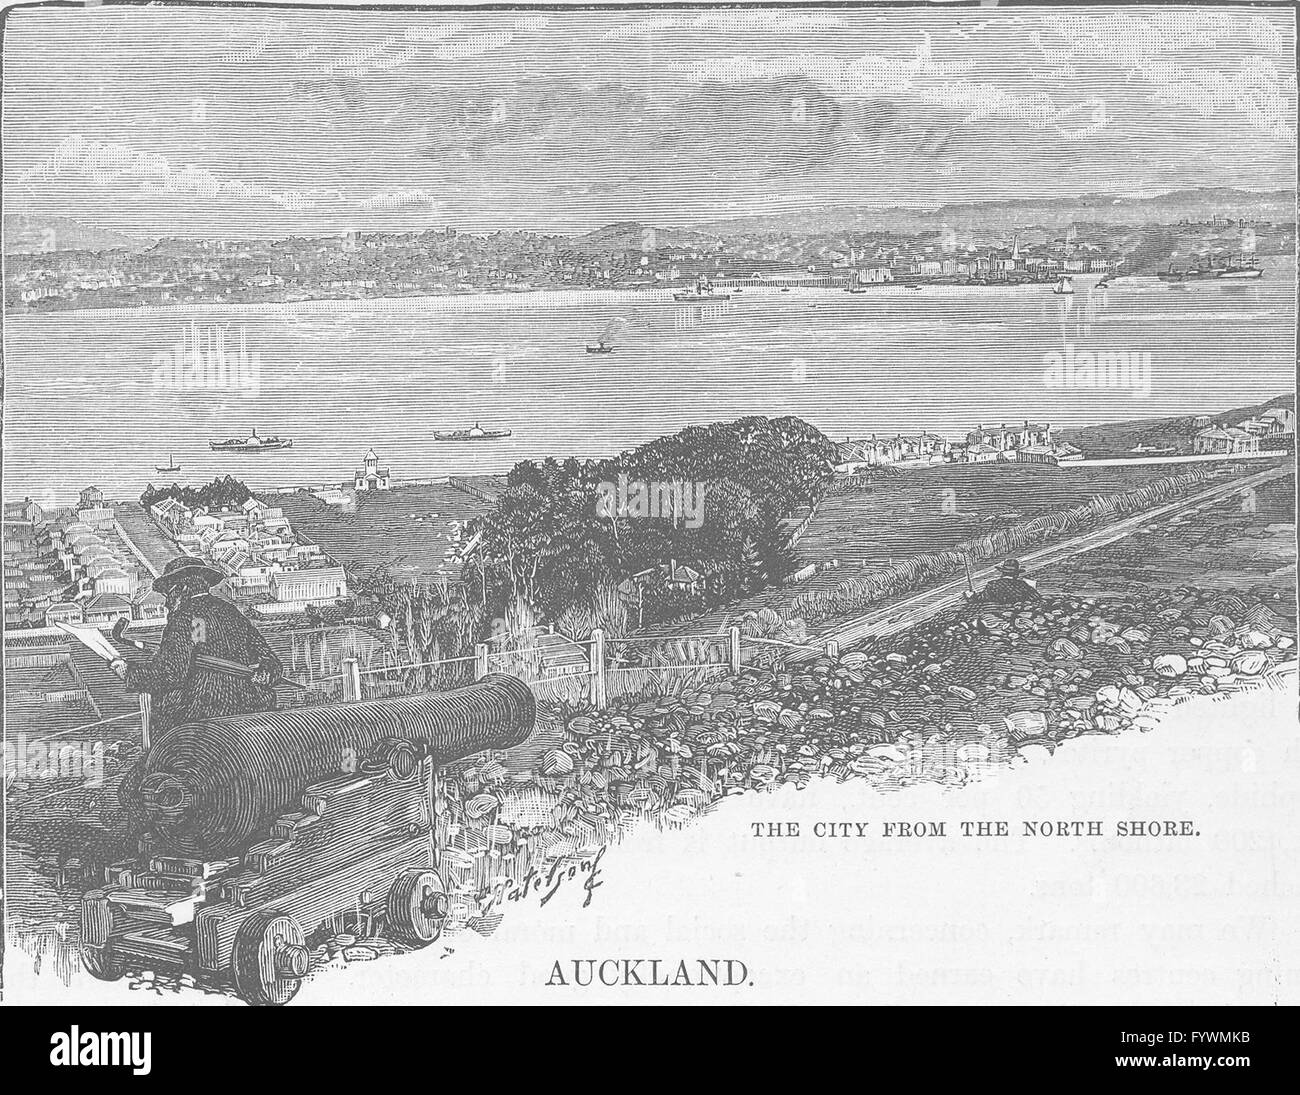 NEW ZEALAND: Auckland: city shore, antique print 1890 - Stock Image